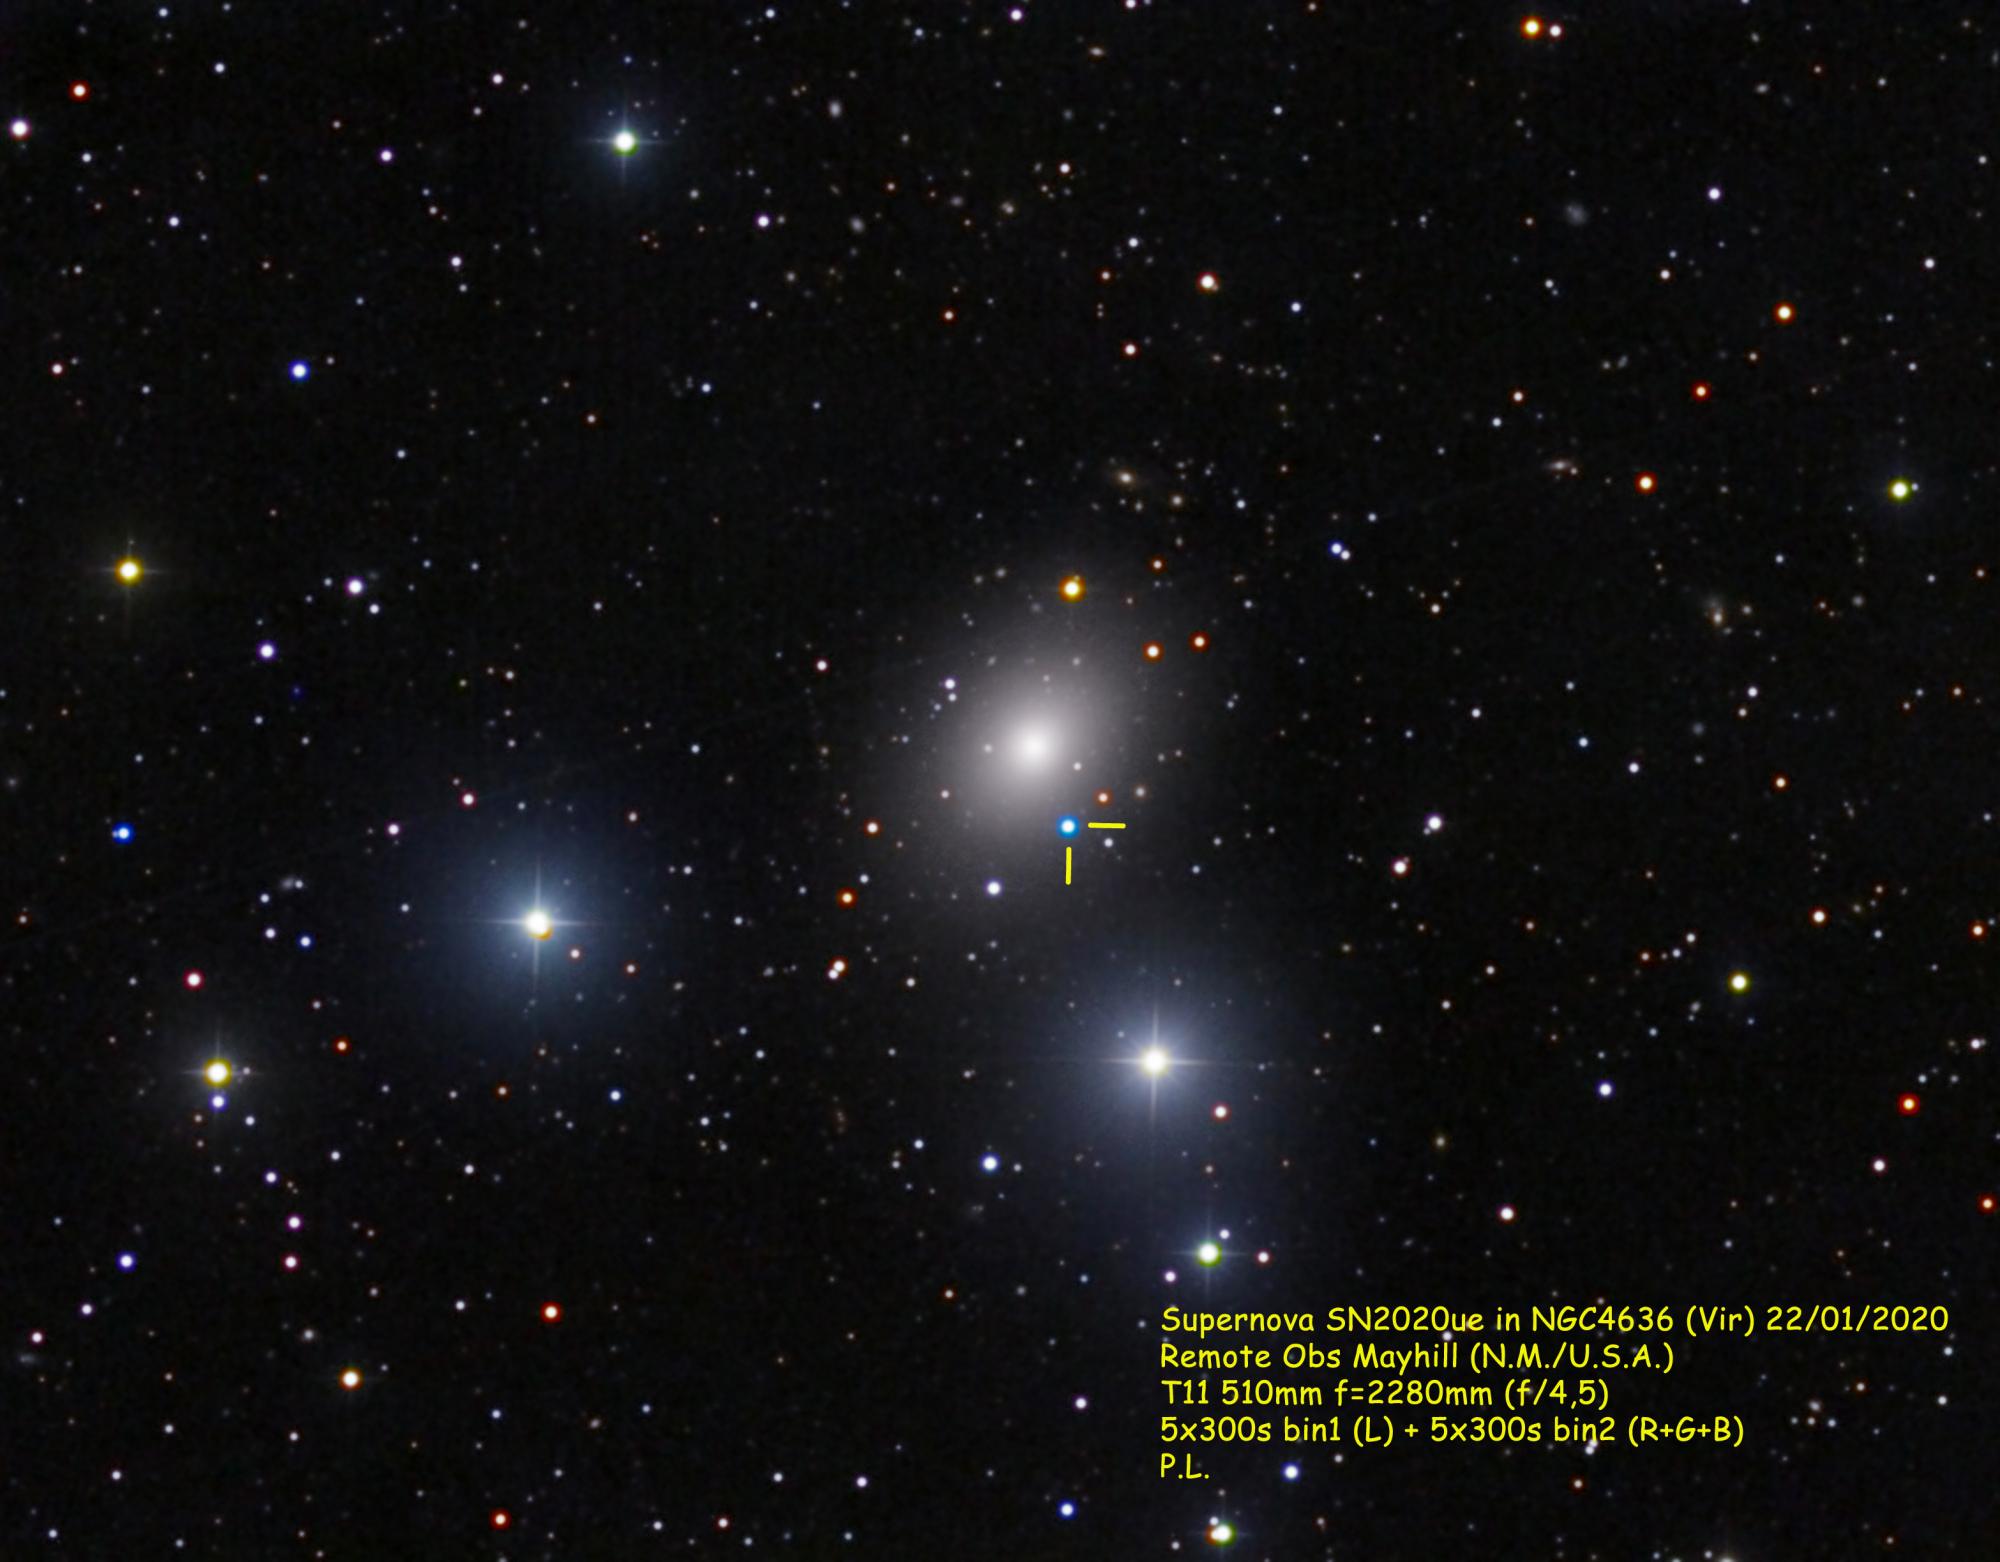 NGC4636_SN2020ue_txt.jpg